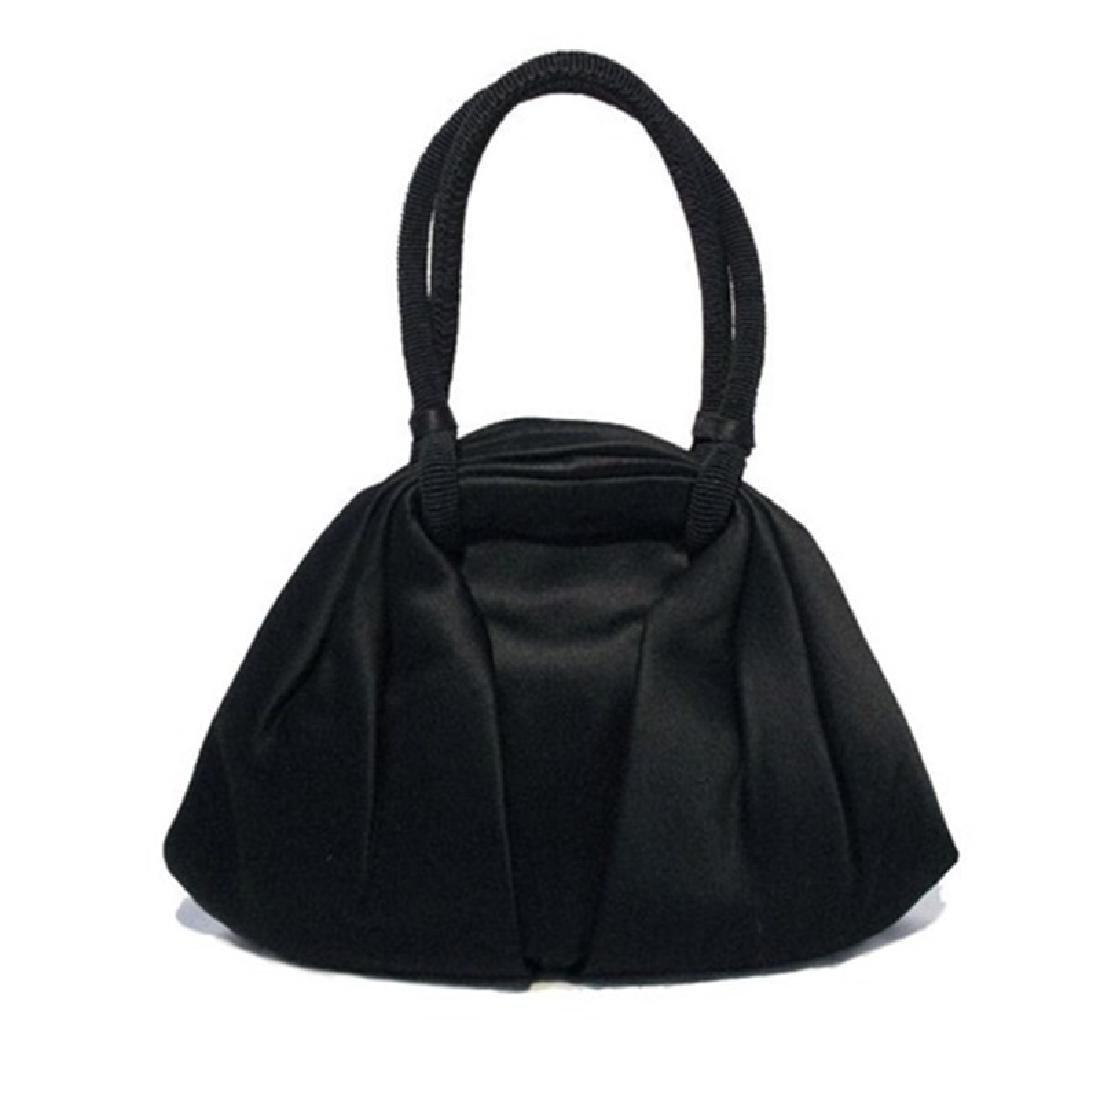 Vintage Collectible 1960's Black Satin Handbag Made in